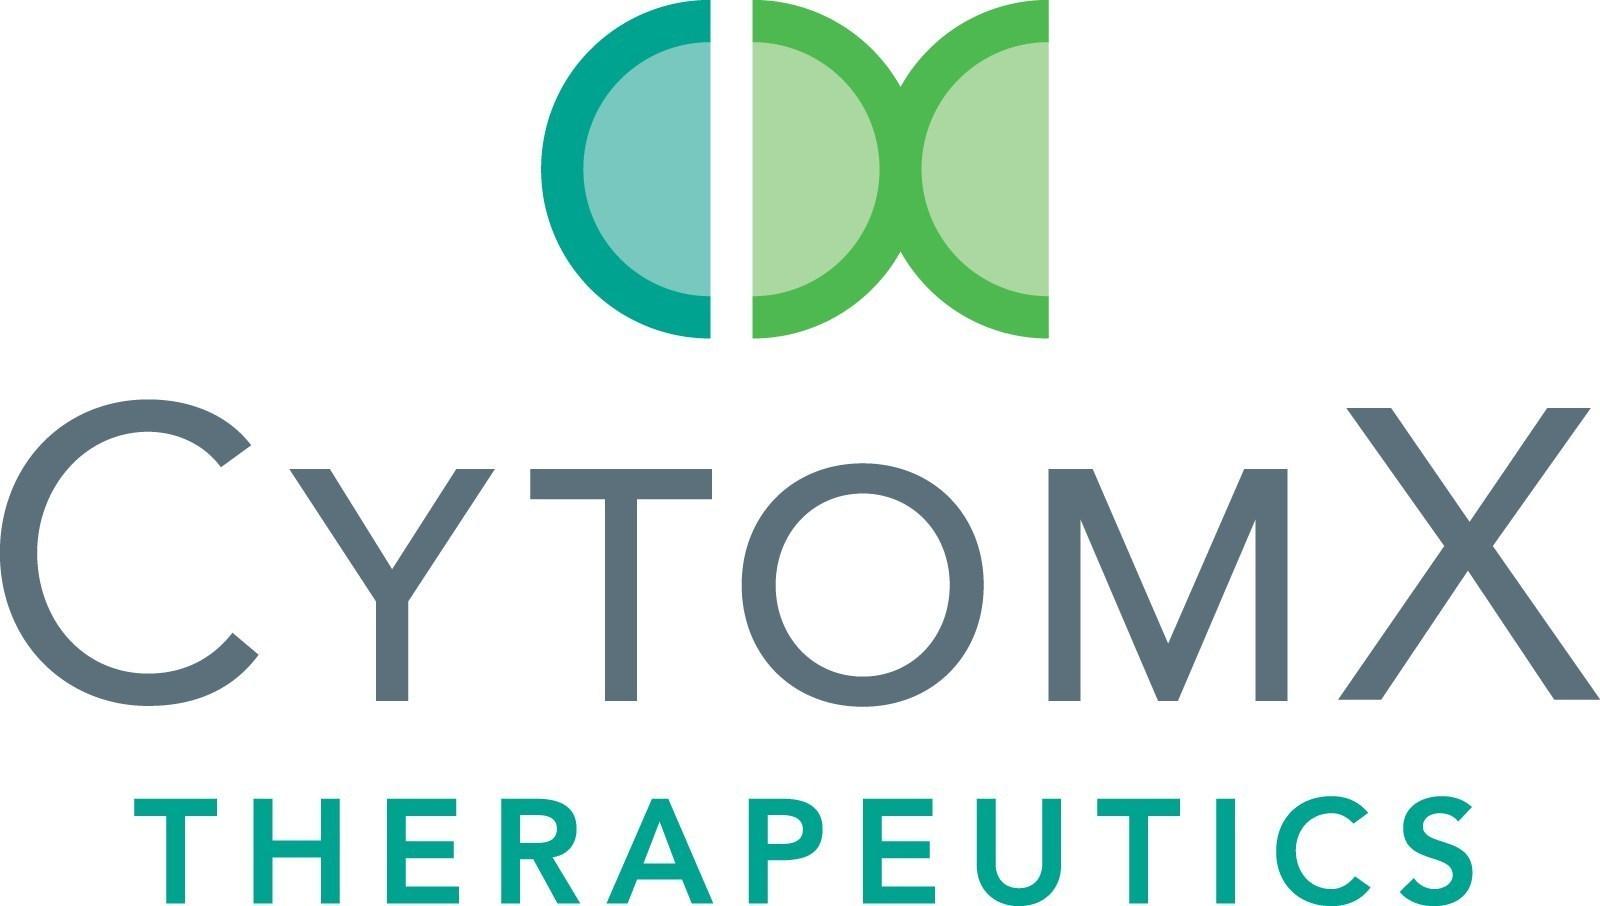 «СайтомЭкс терапьютикс» (CytomX Therapeutics).